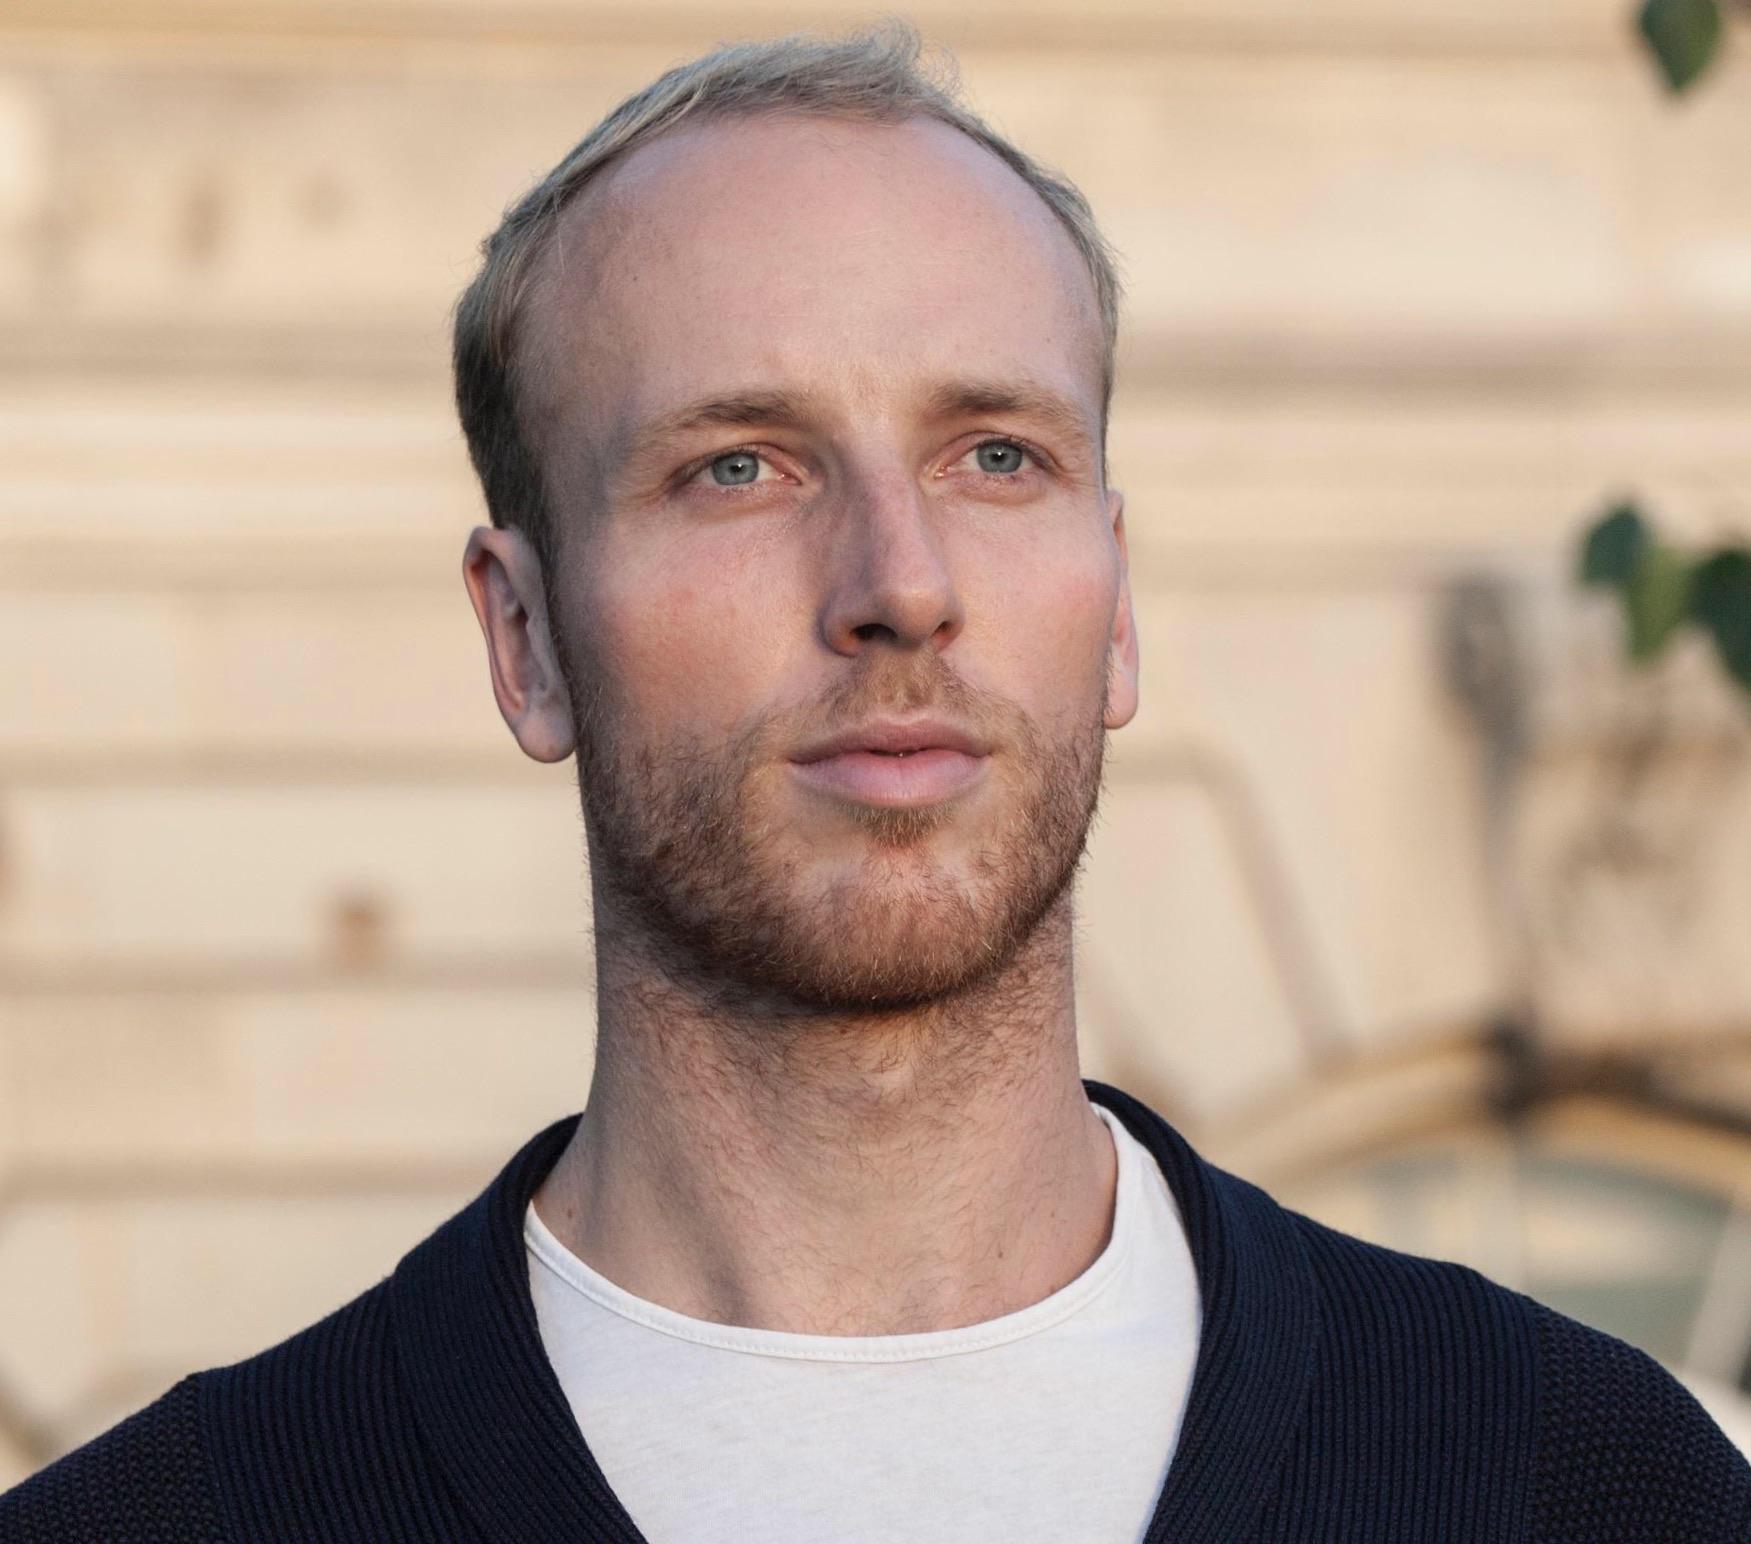 Florian Hille